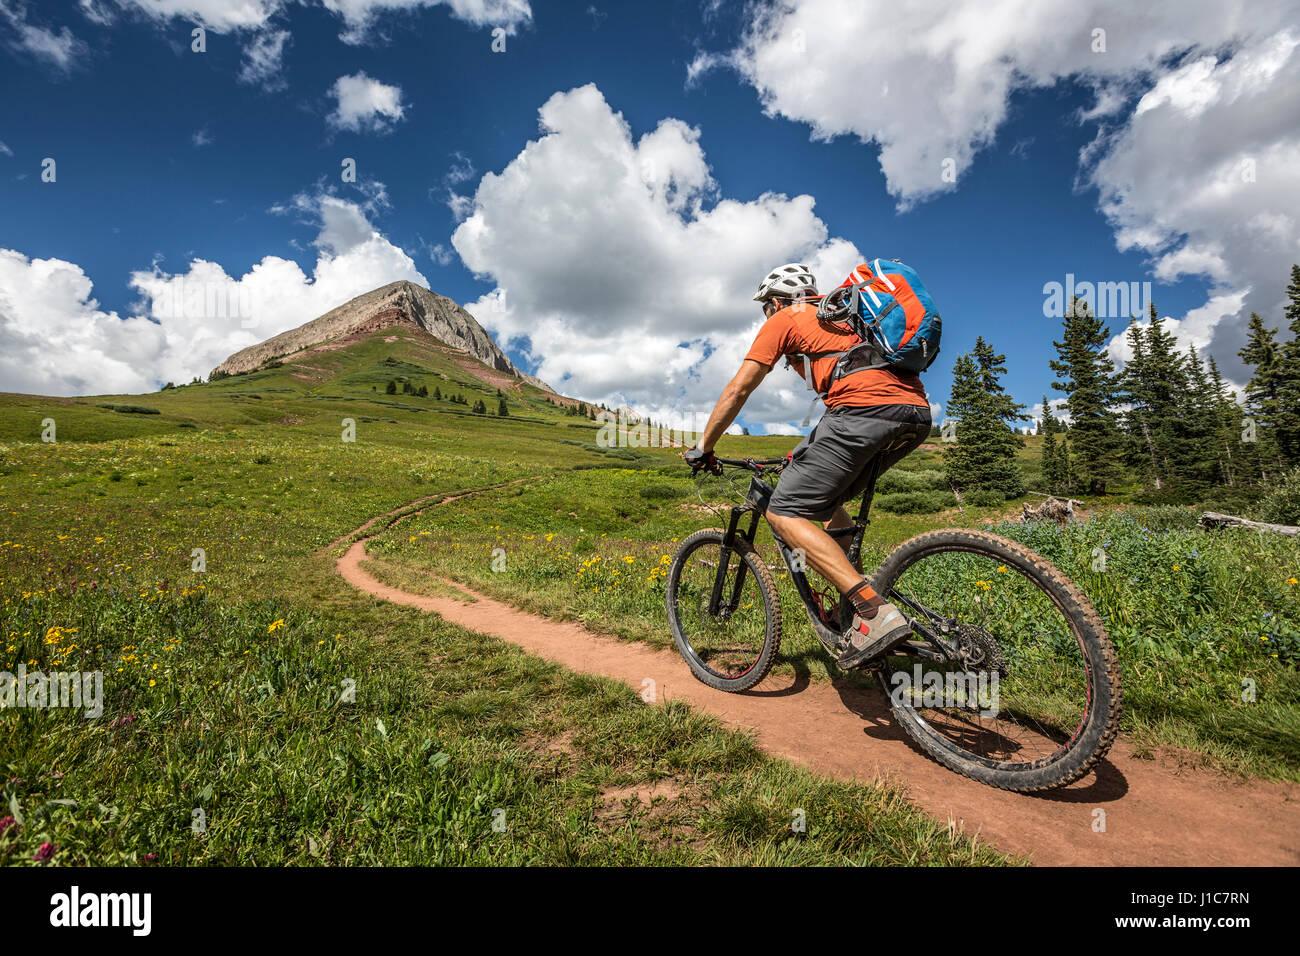 Eric Niestetal vtt sentier du col de l'ingénieur vers Mountain, Colorado. Photo Stock